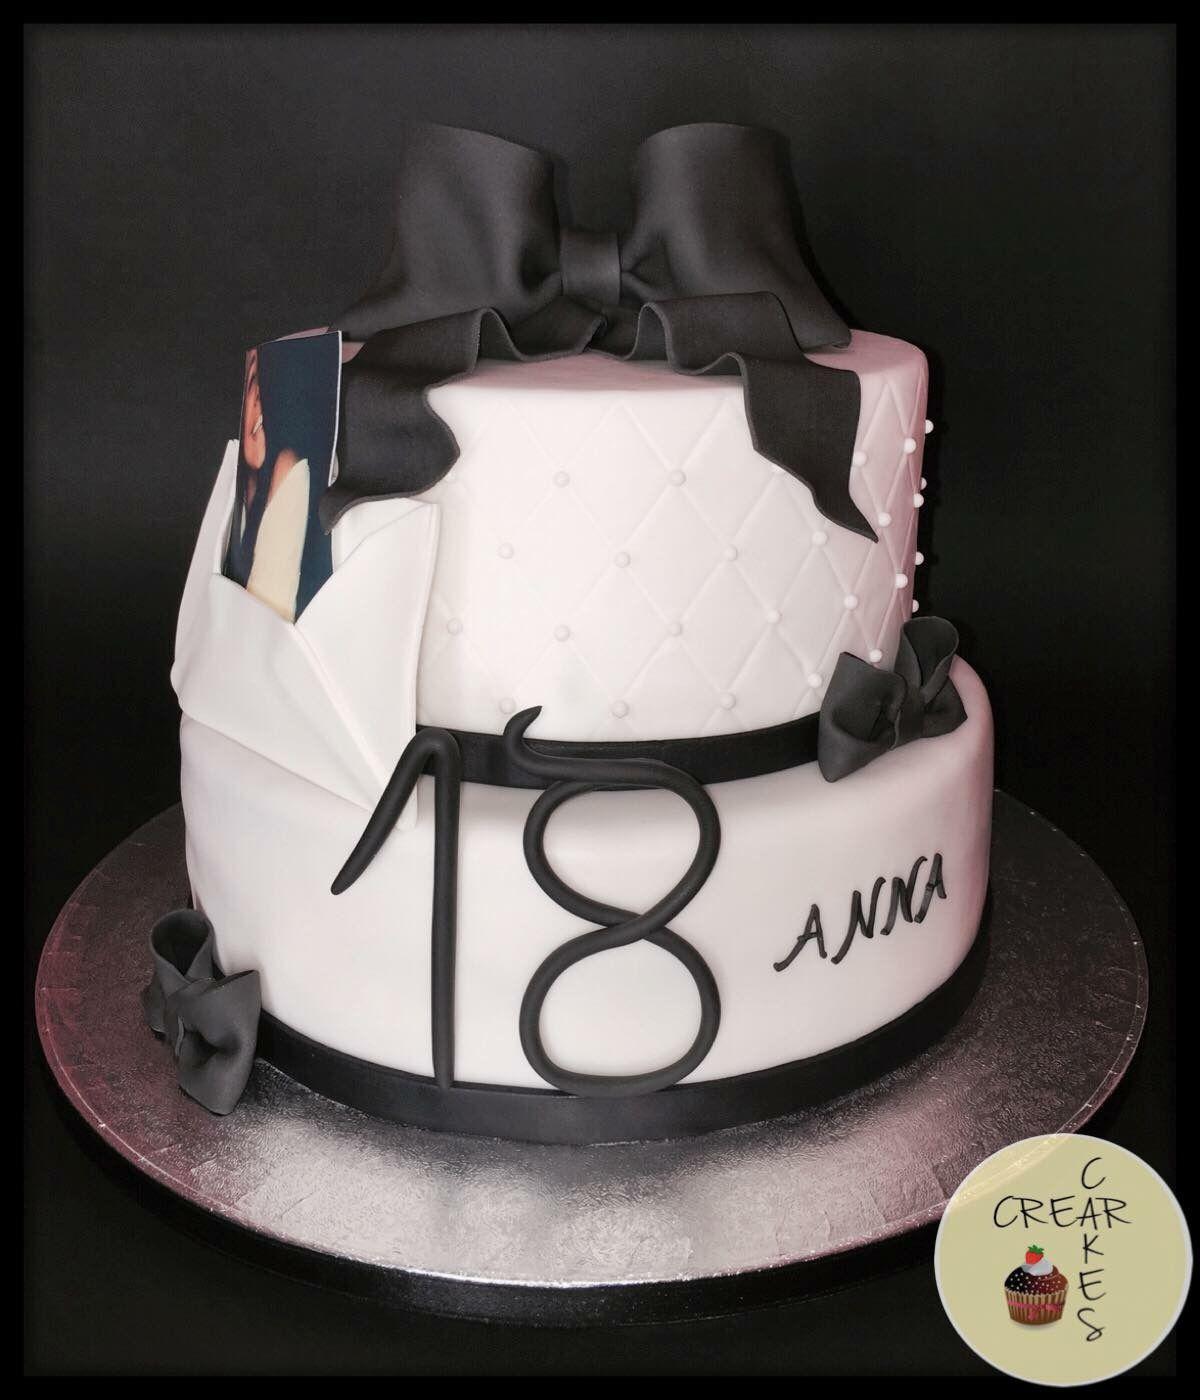 Pin By Deborah EF On Birthday Ideas